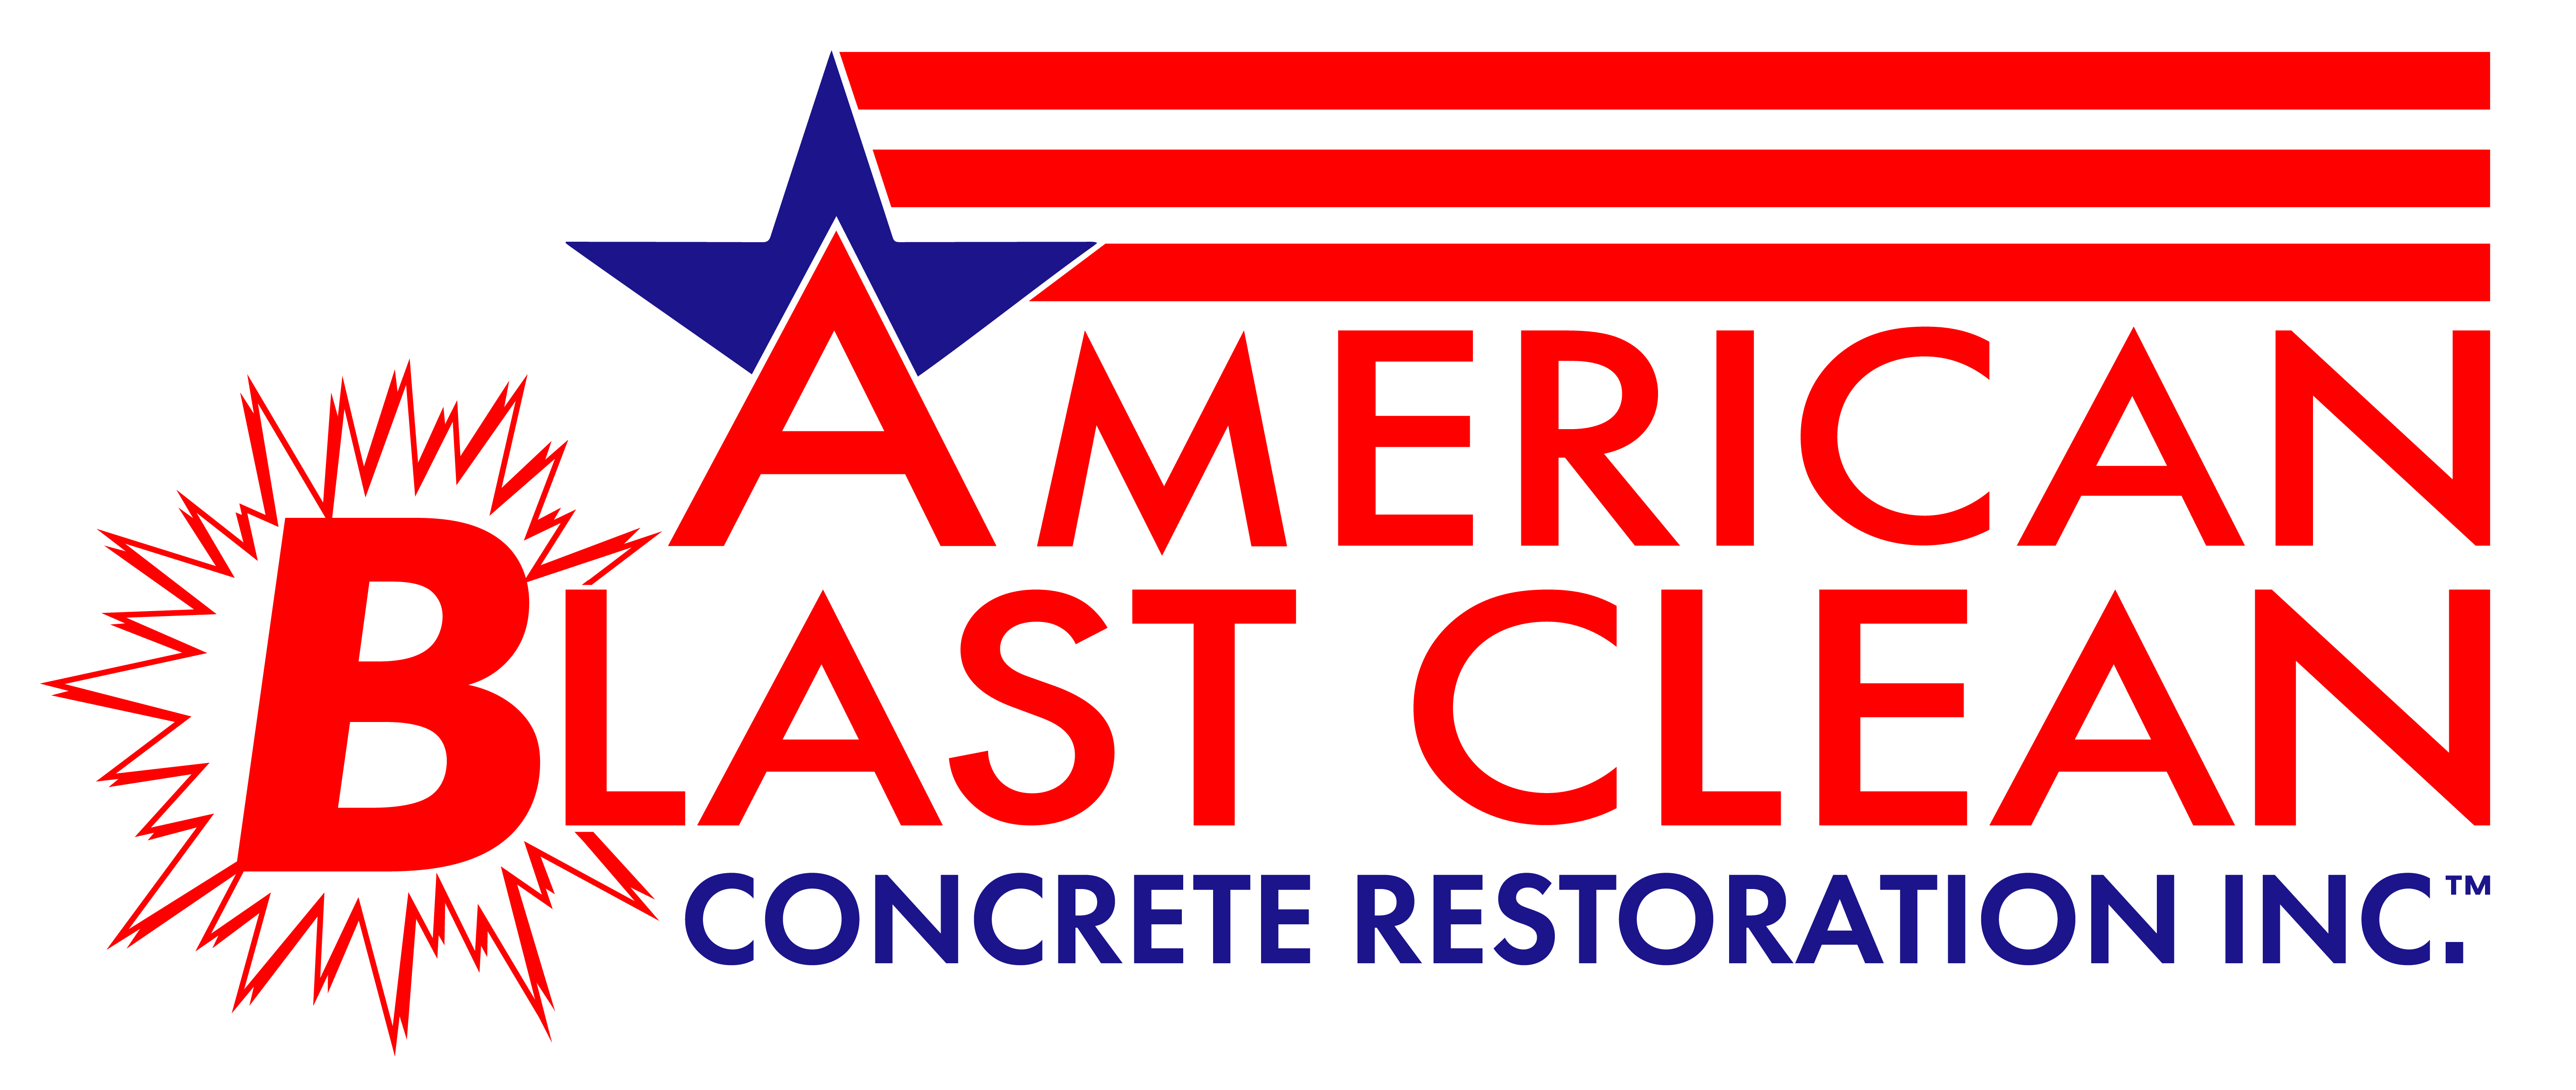 American Blast Clean Concrete Restoration